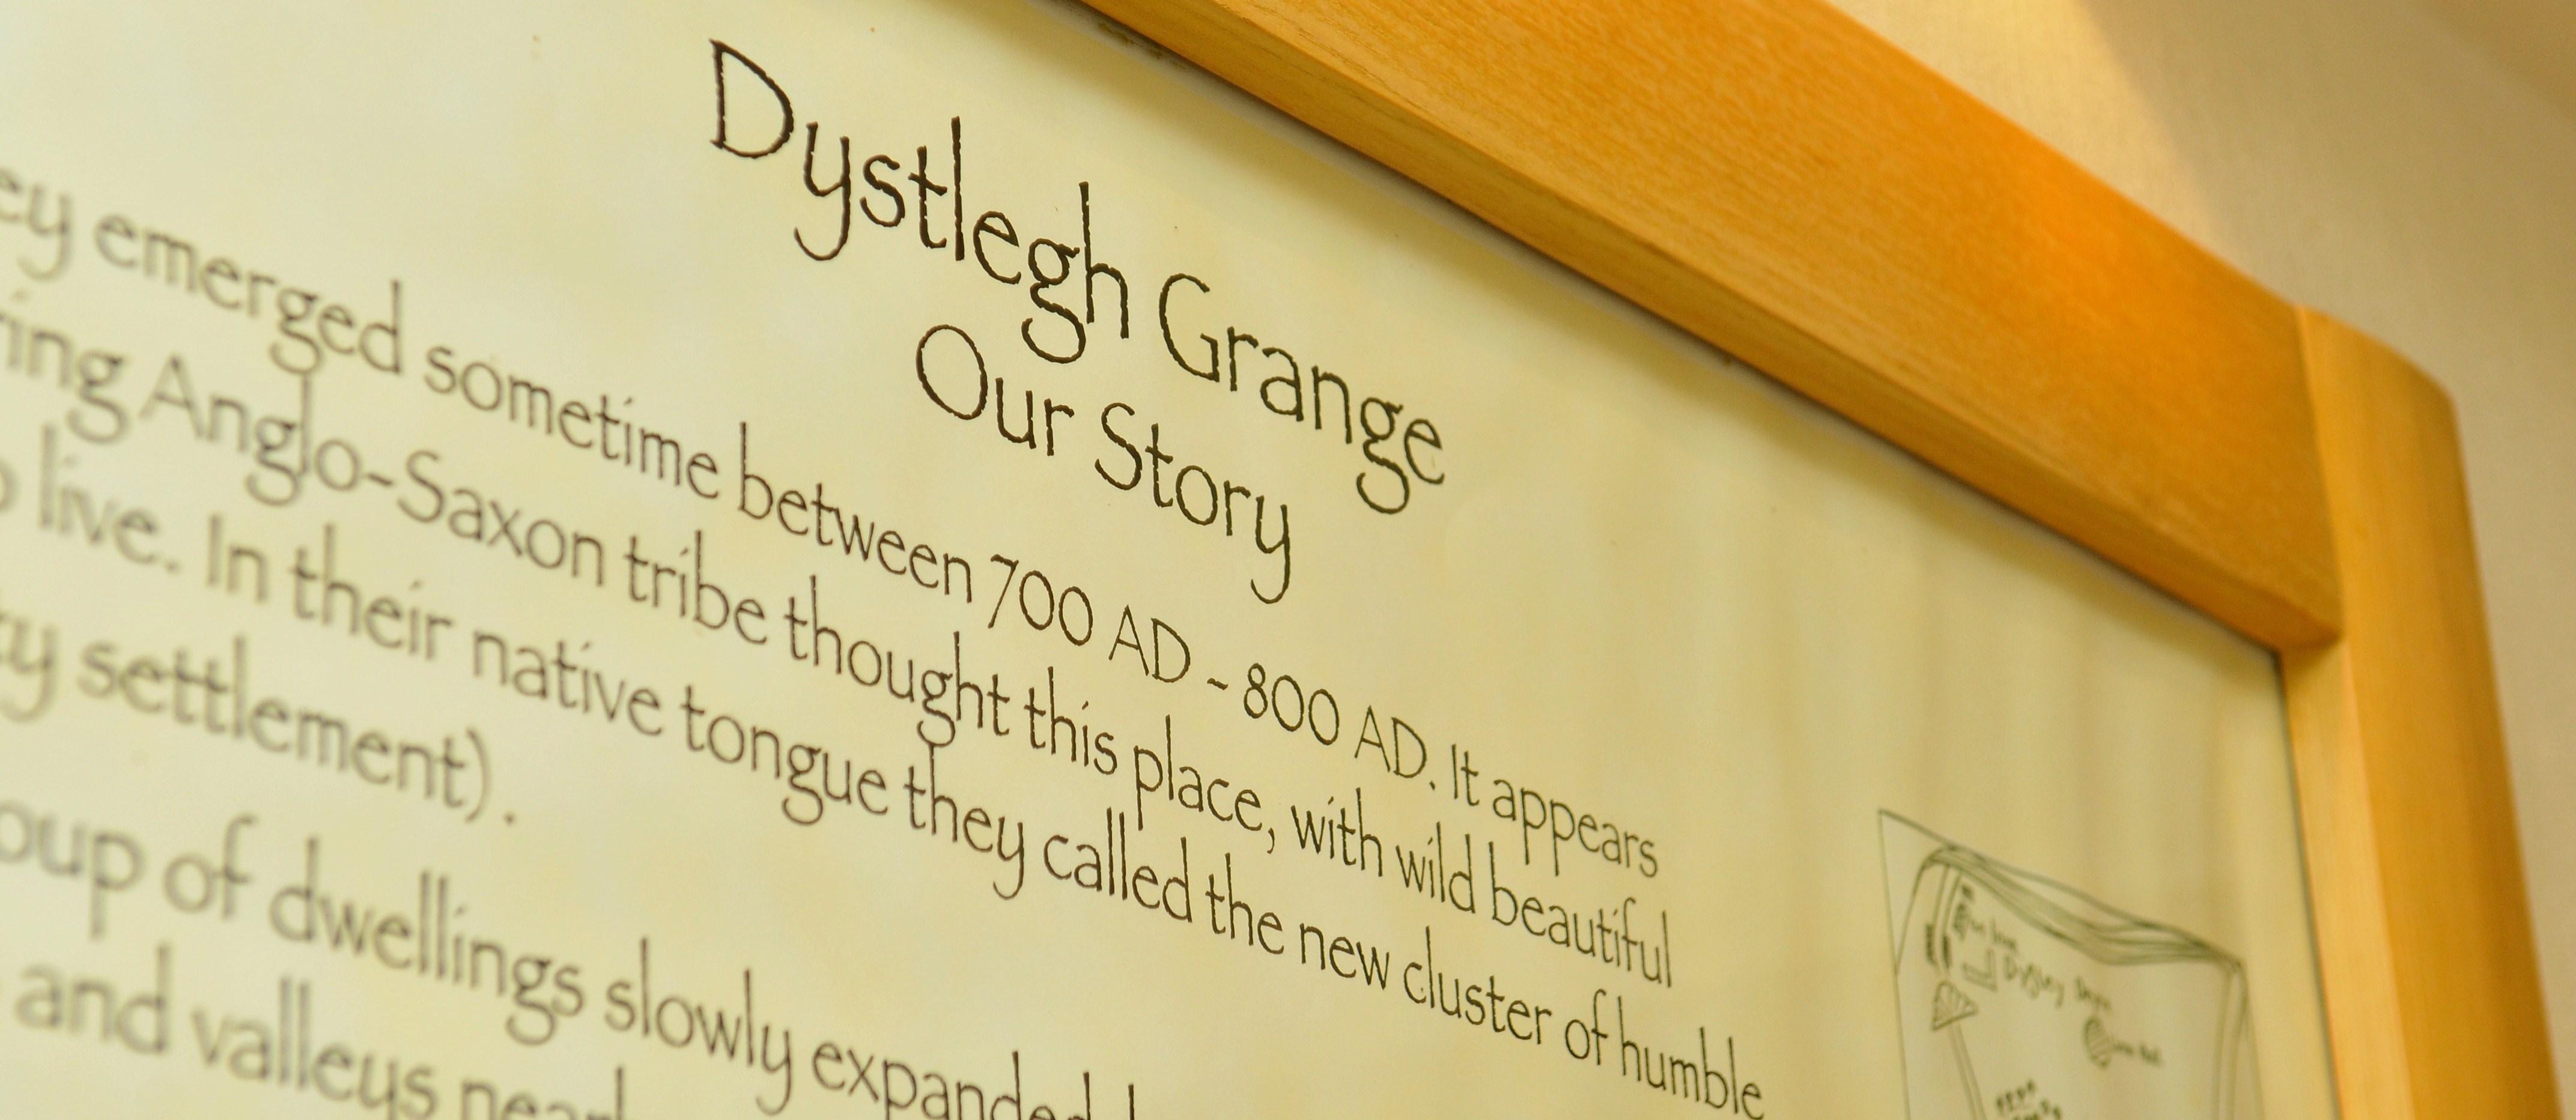 A History of Dystlegh Grange